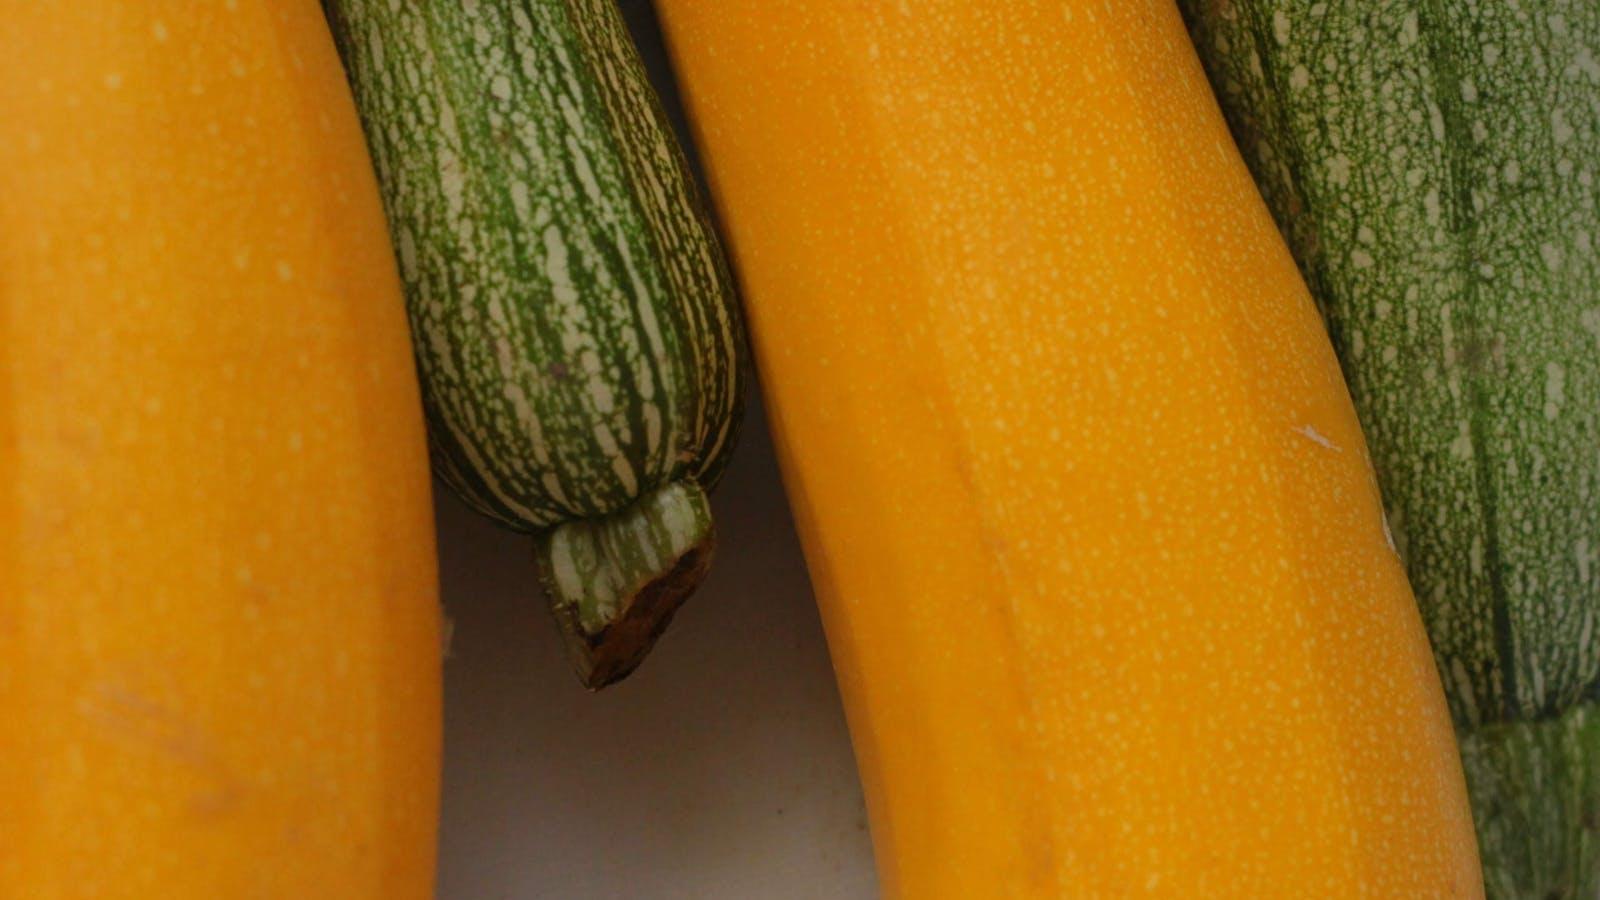 Courgette vert clair et jaune